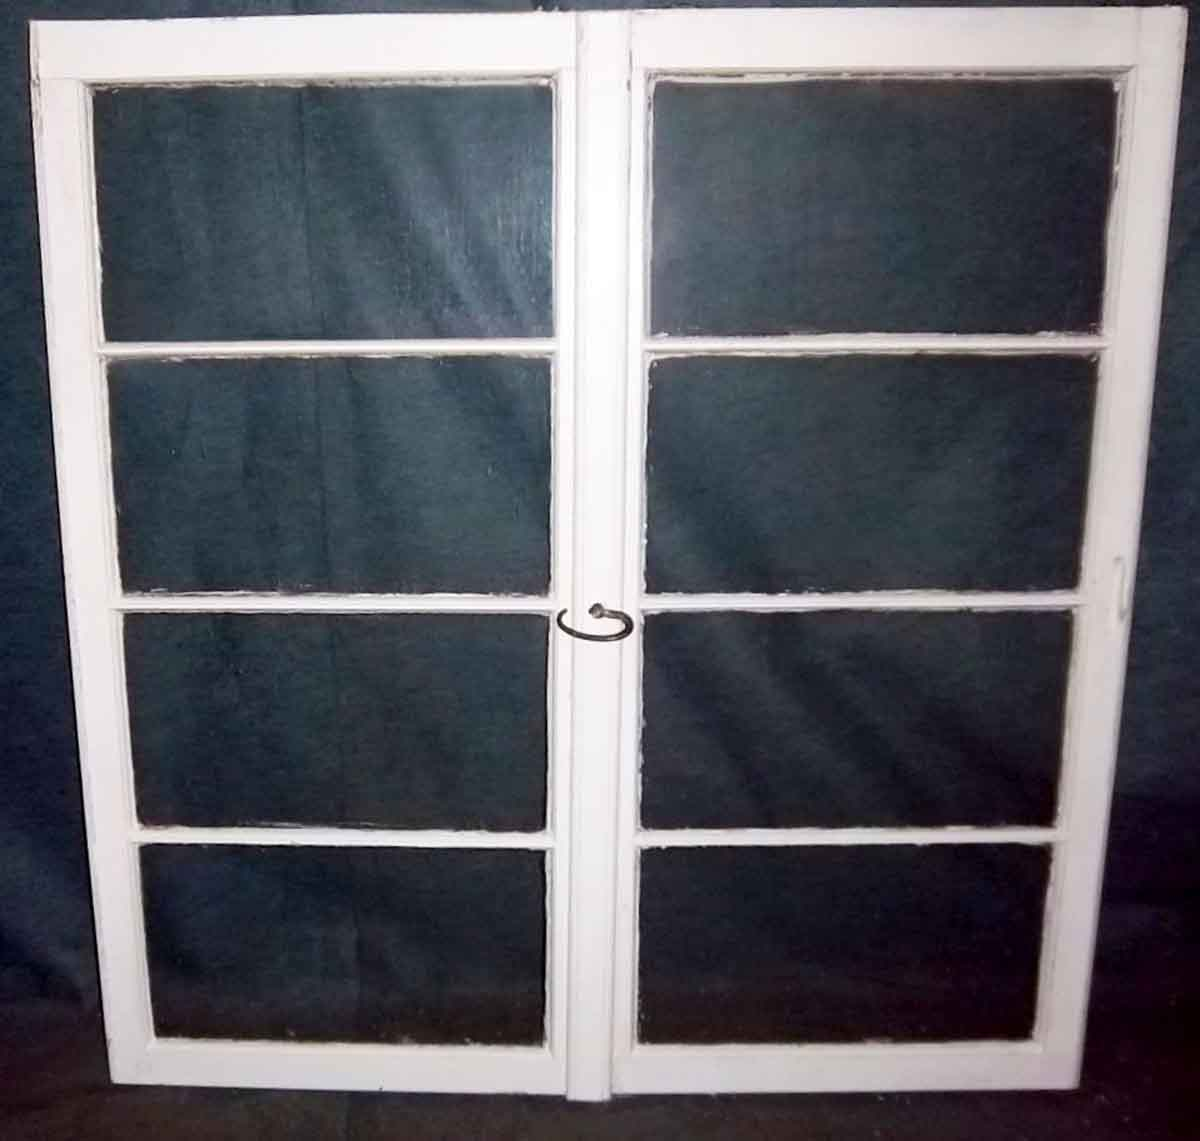 Four Pane Sliding Glass Windows